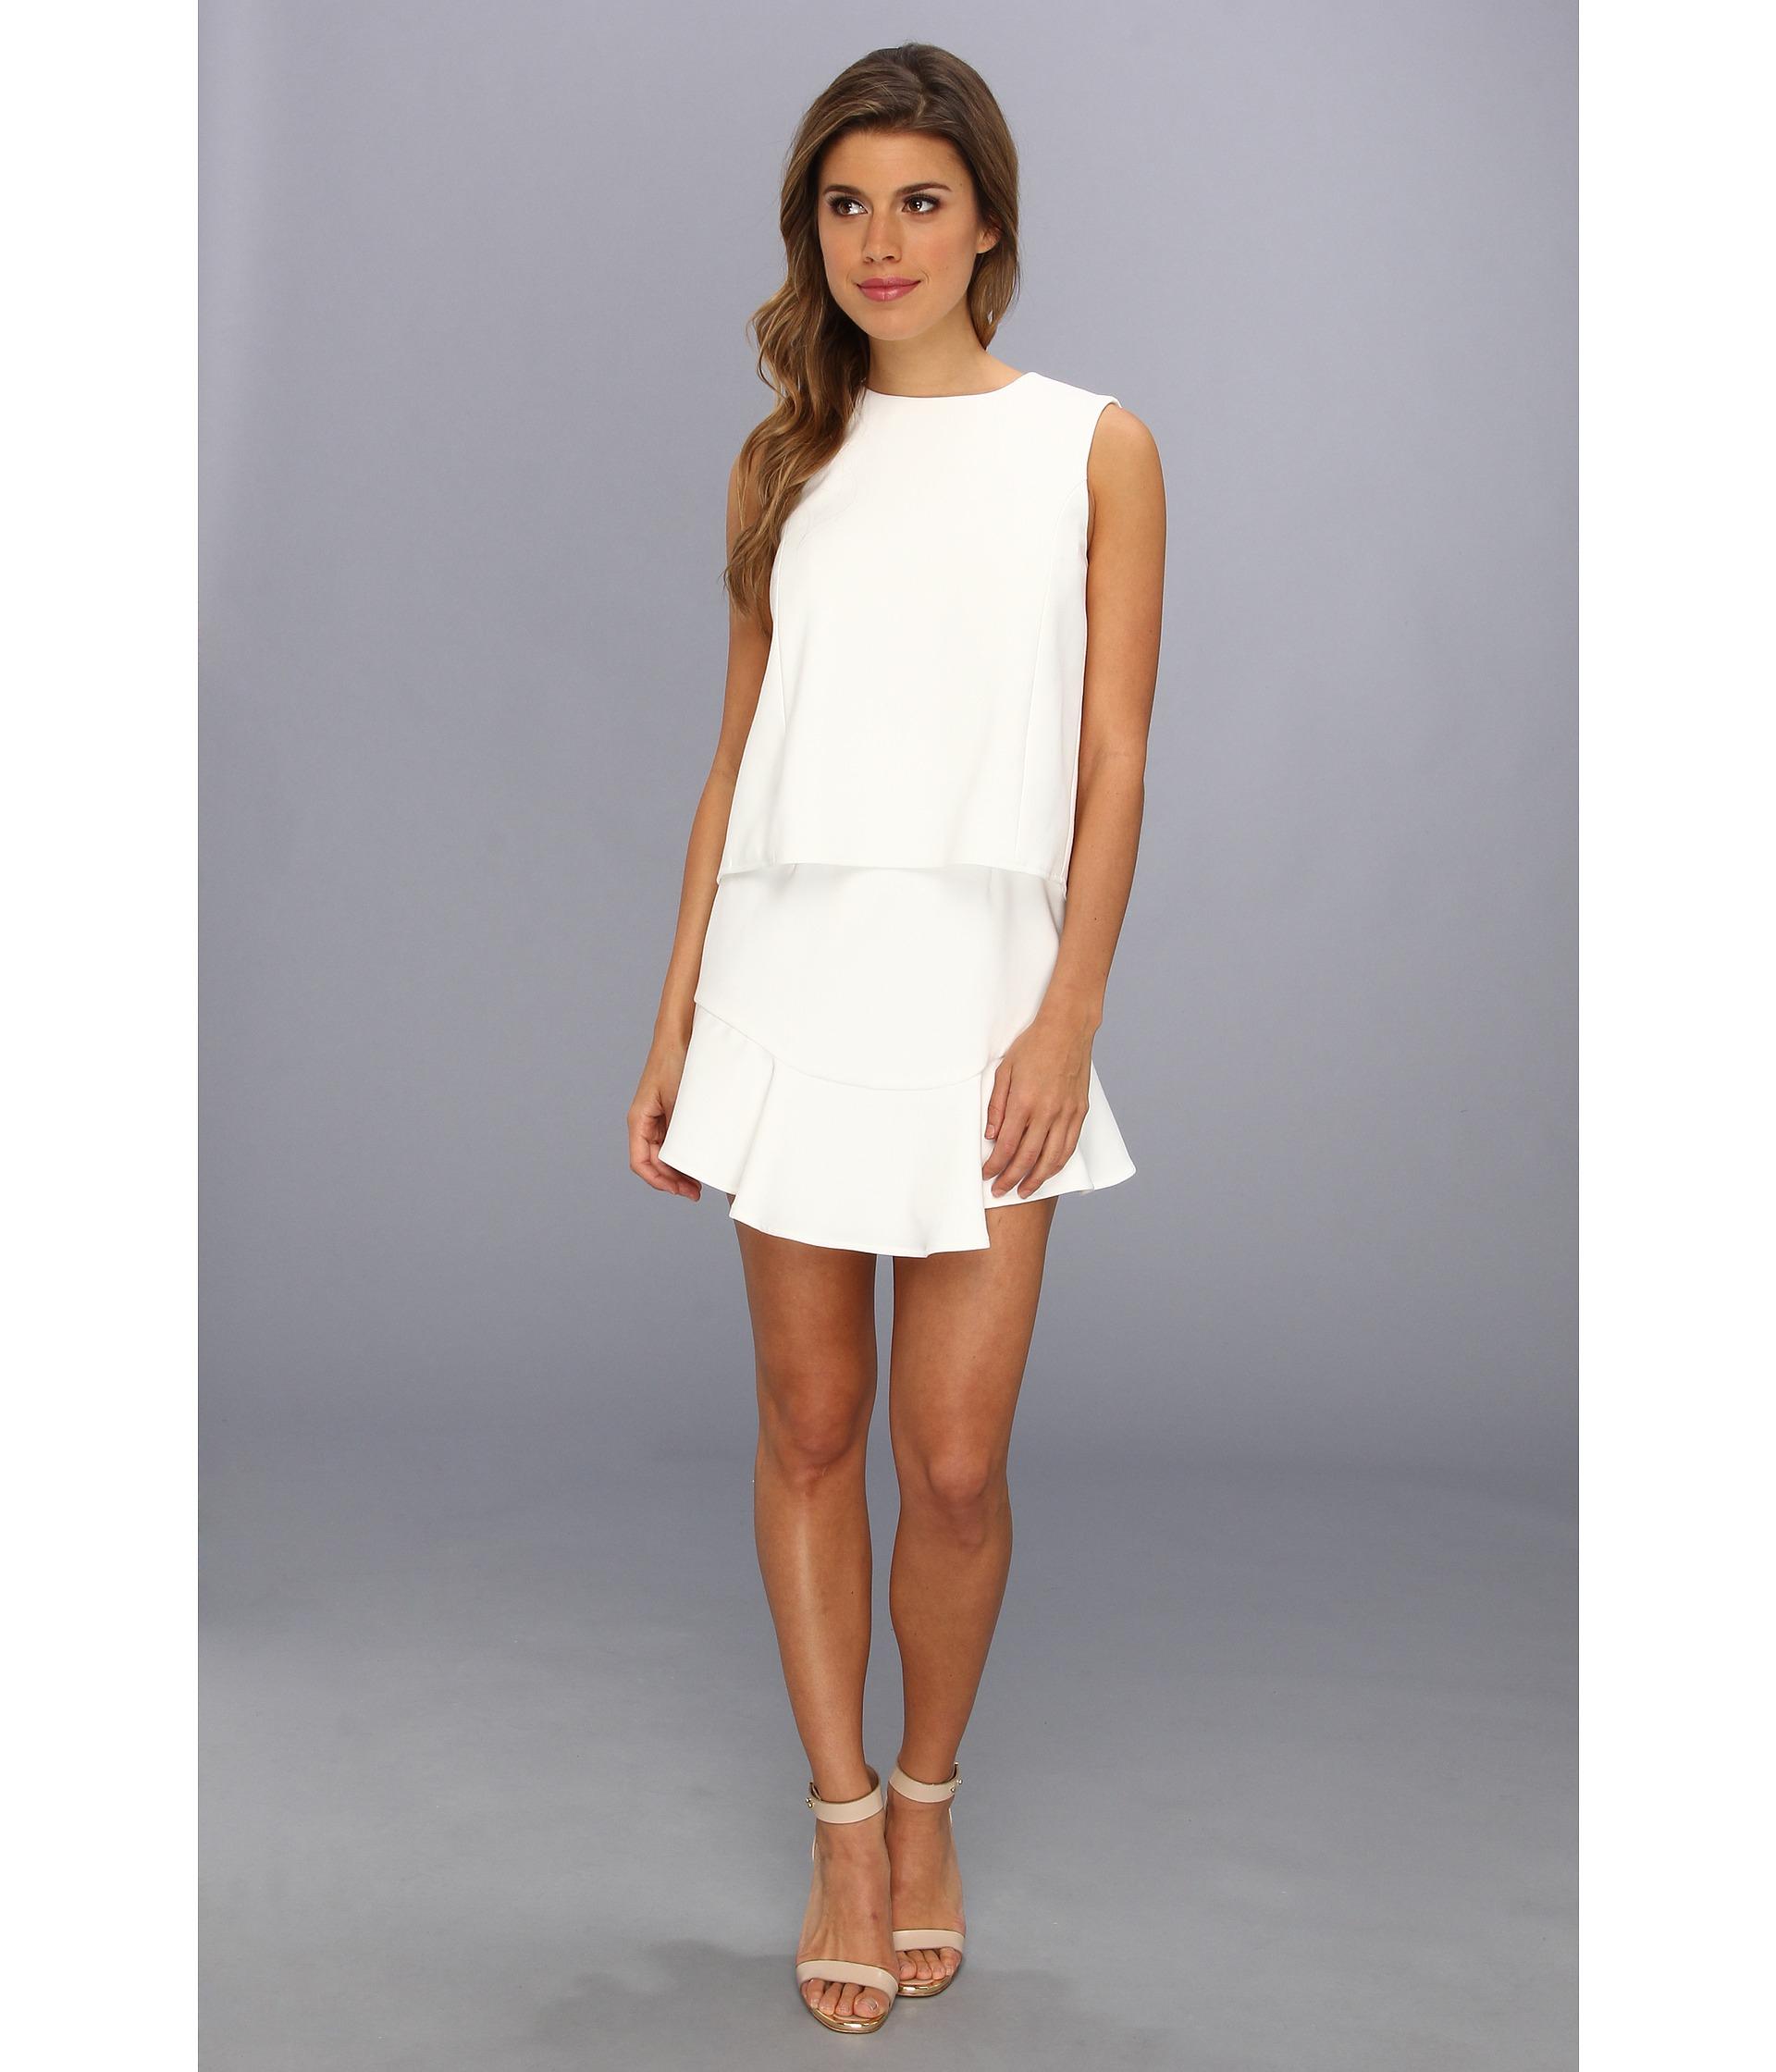 bcbgmaxazria vivian sleeveless ruffle hem dress in white. Black Bedroom Furniture Sets. Home Design Ideas